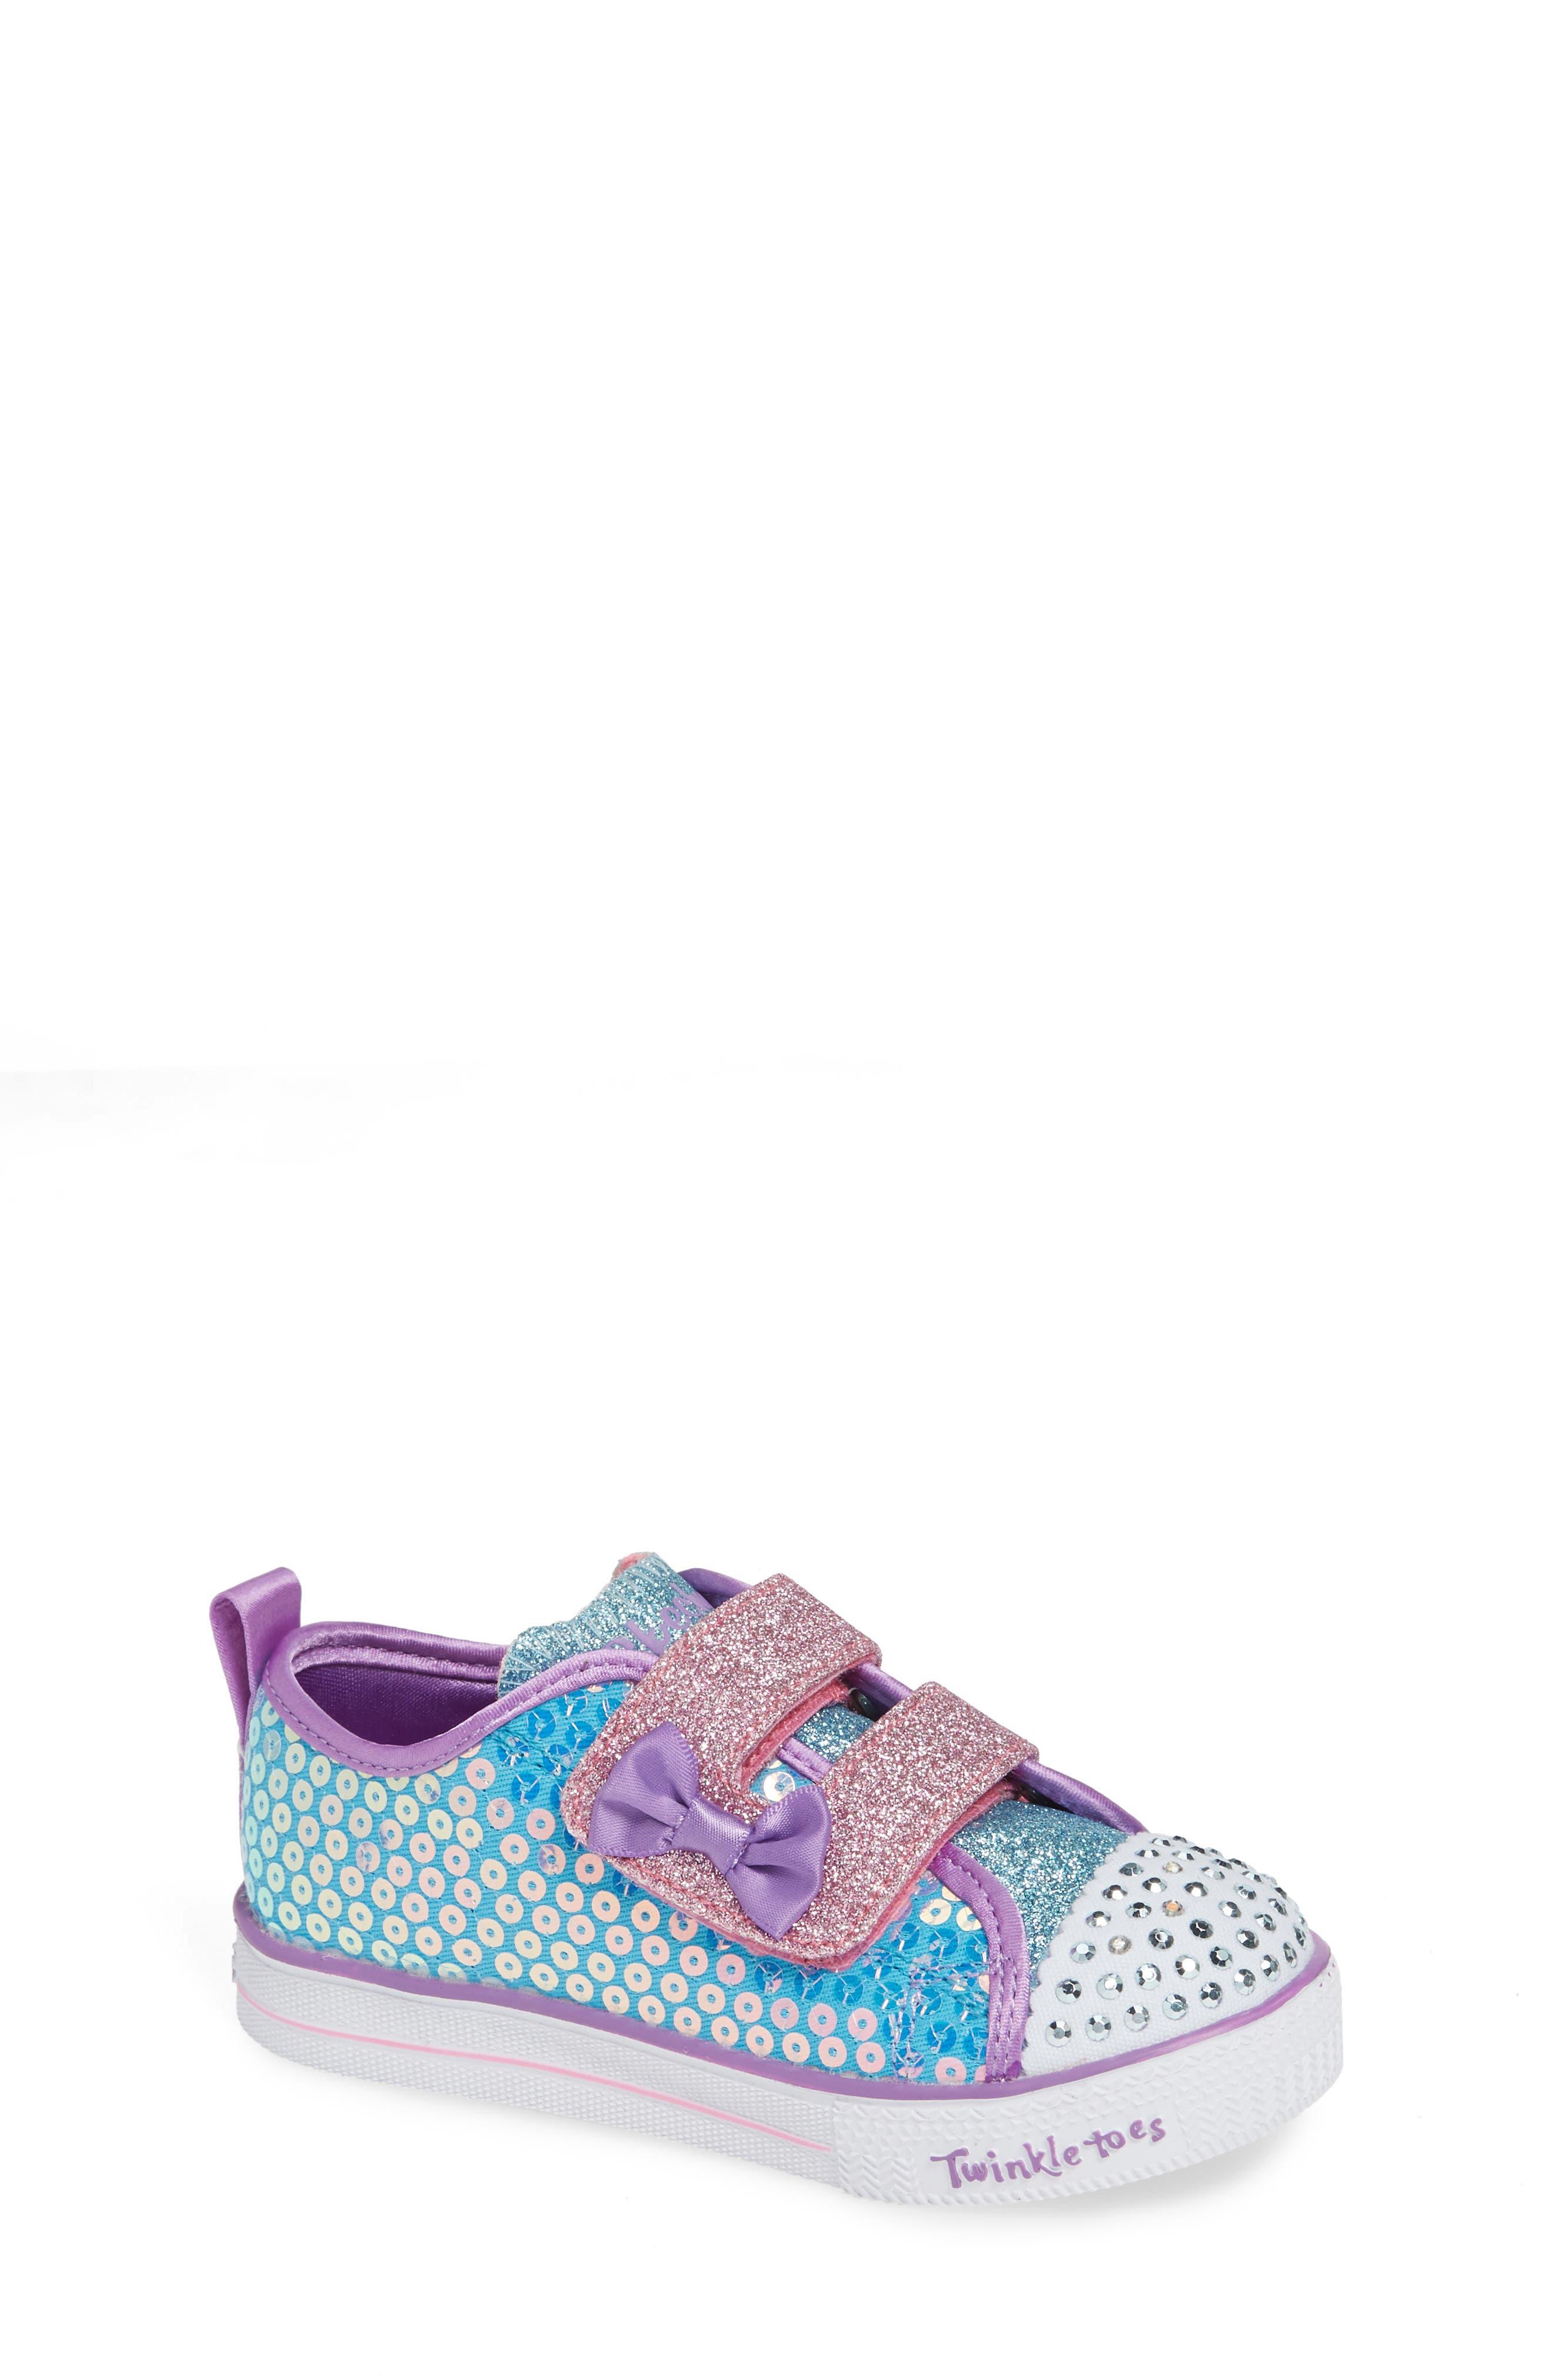 Shuffle Lite Glitter Sneaker,                             Main thumbnail 1, color,                             TURQUOISE/MULTI